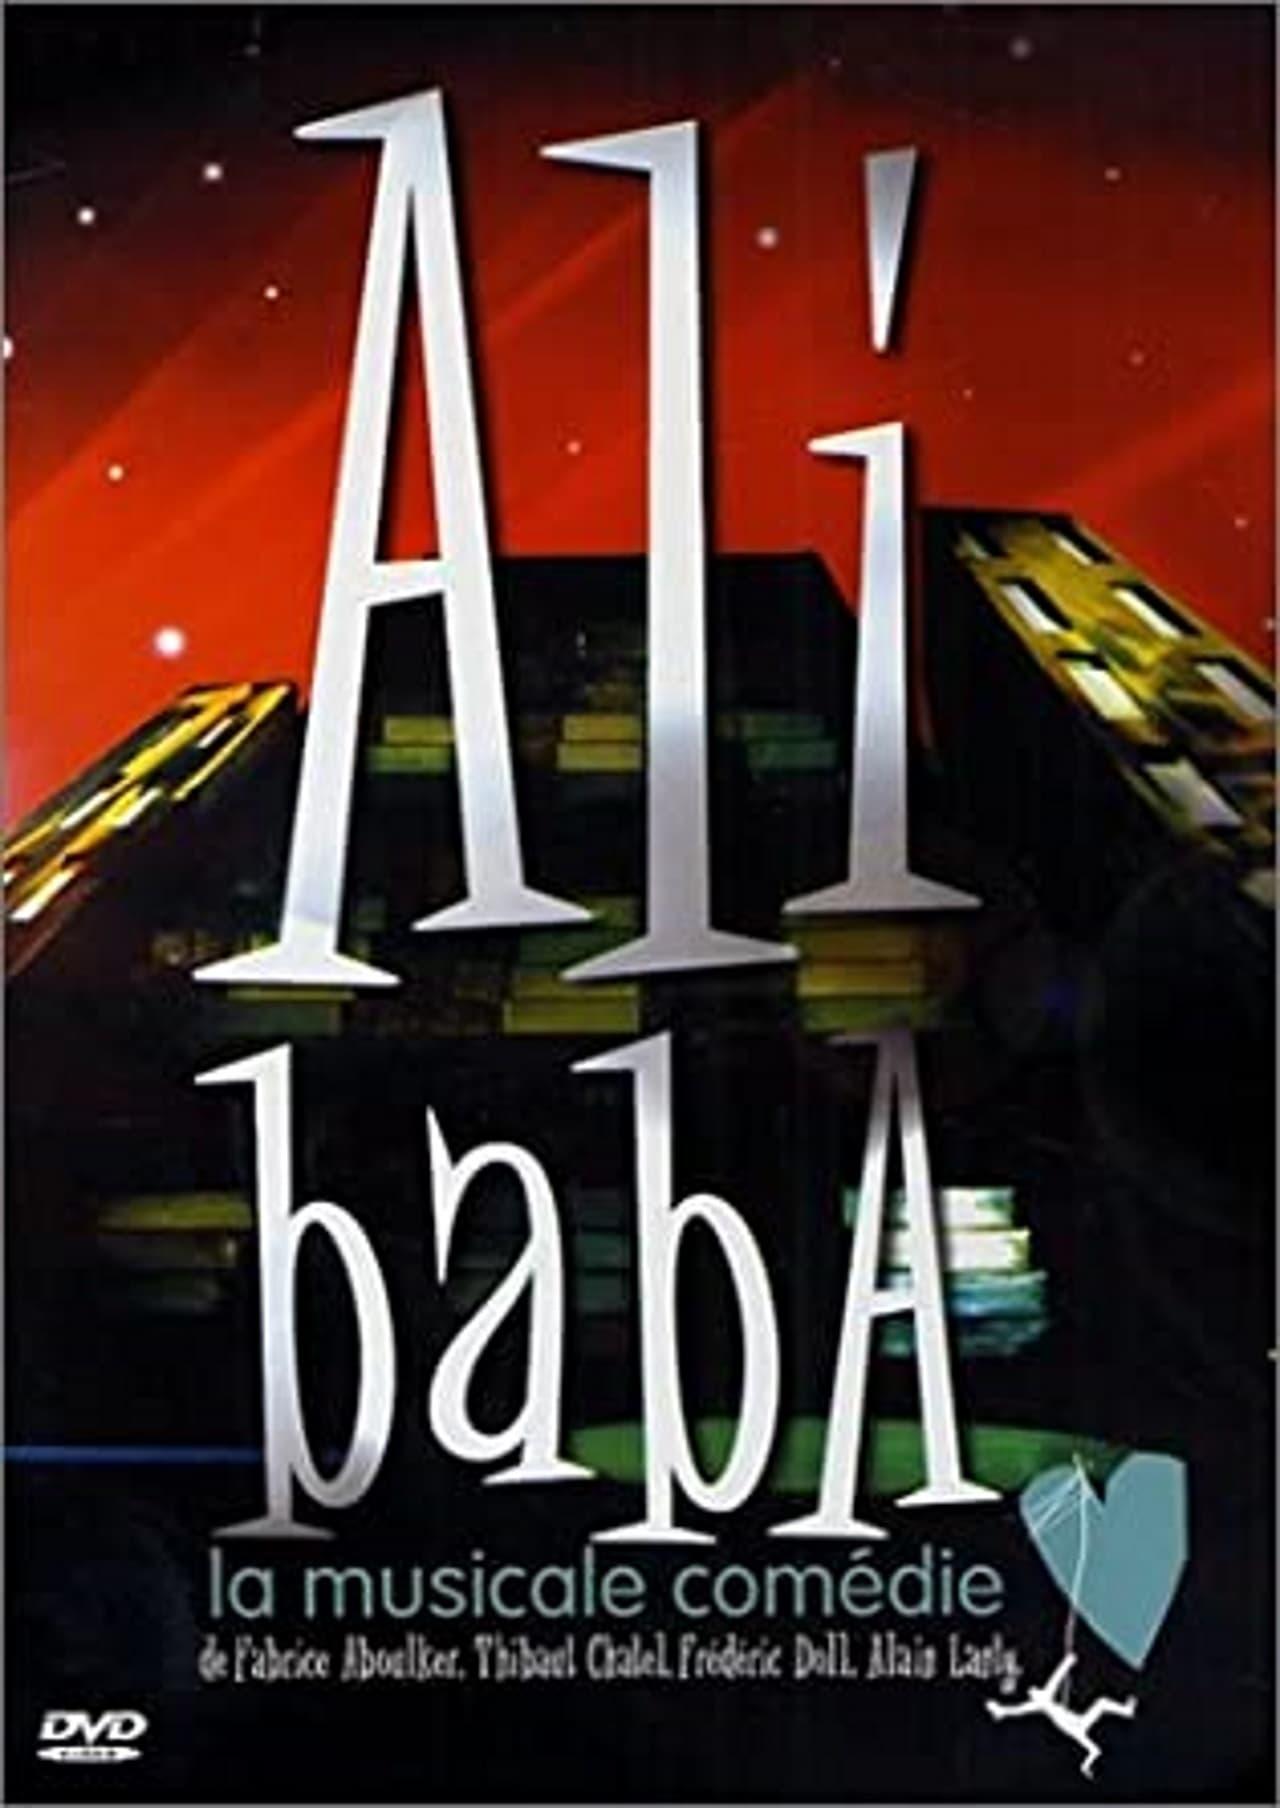 Ali Baba, la musicale comédie